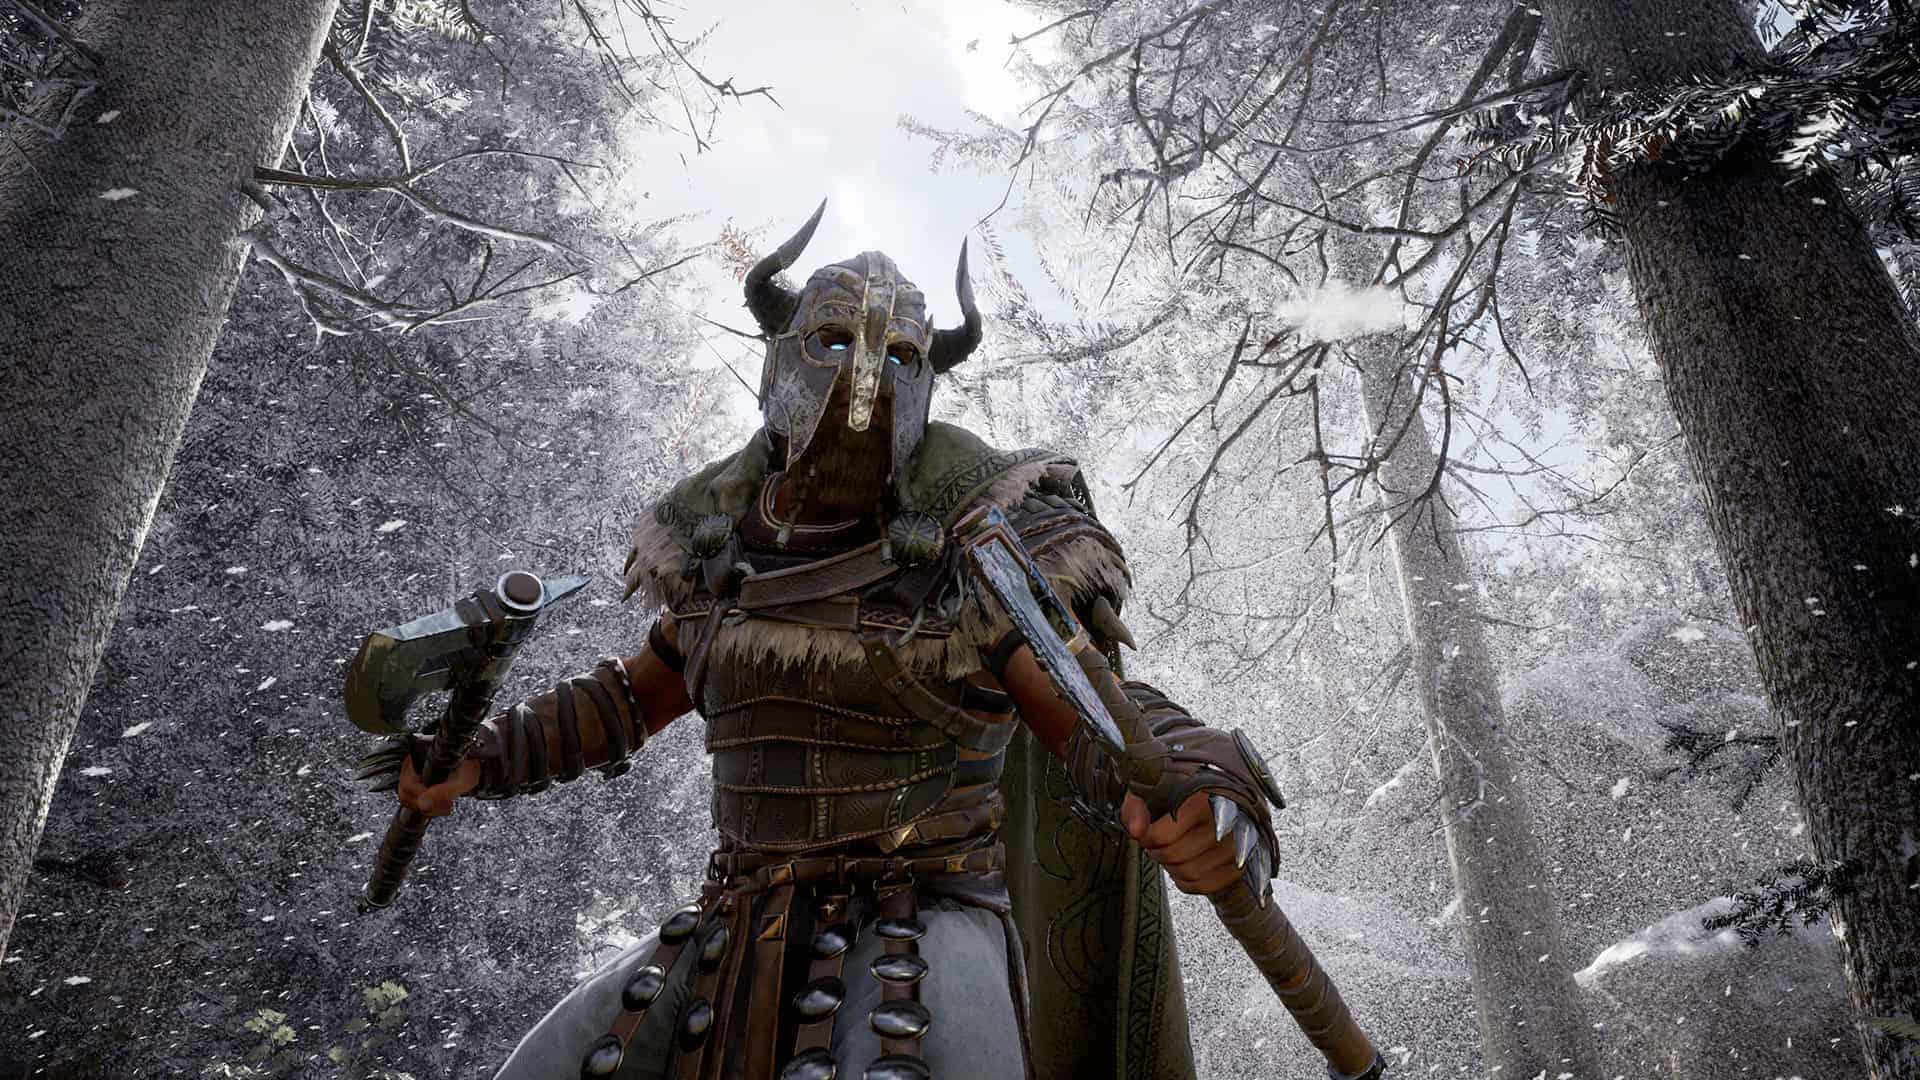 Mortal Online 2 December & January Roadmap 2